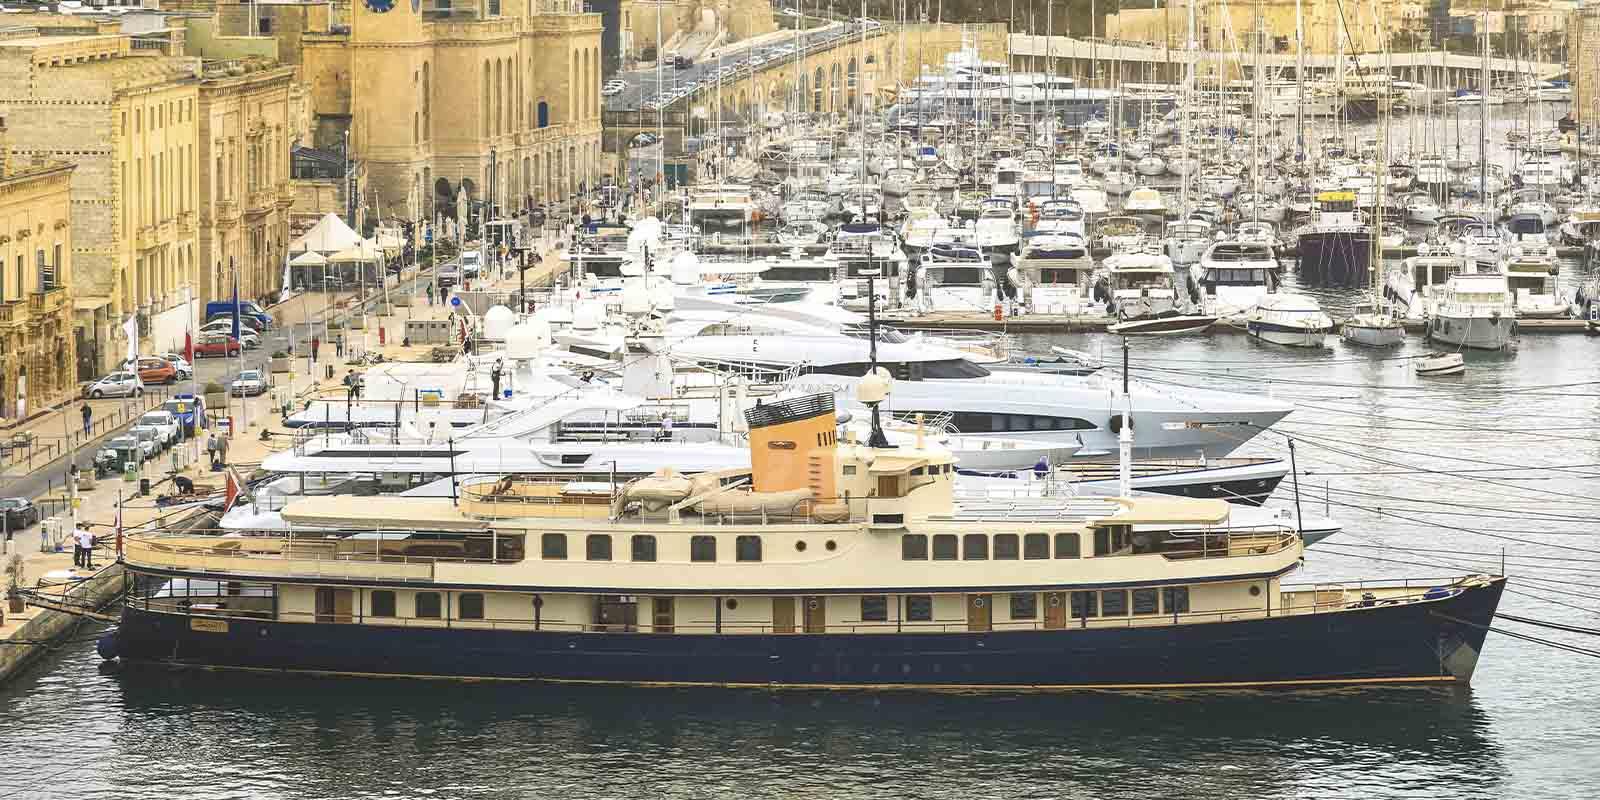 Malta Citizenship by Investment - Savory & Partners - Dubai, UAE